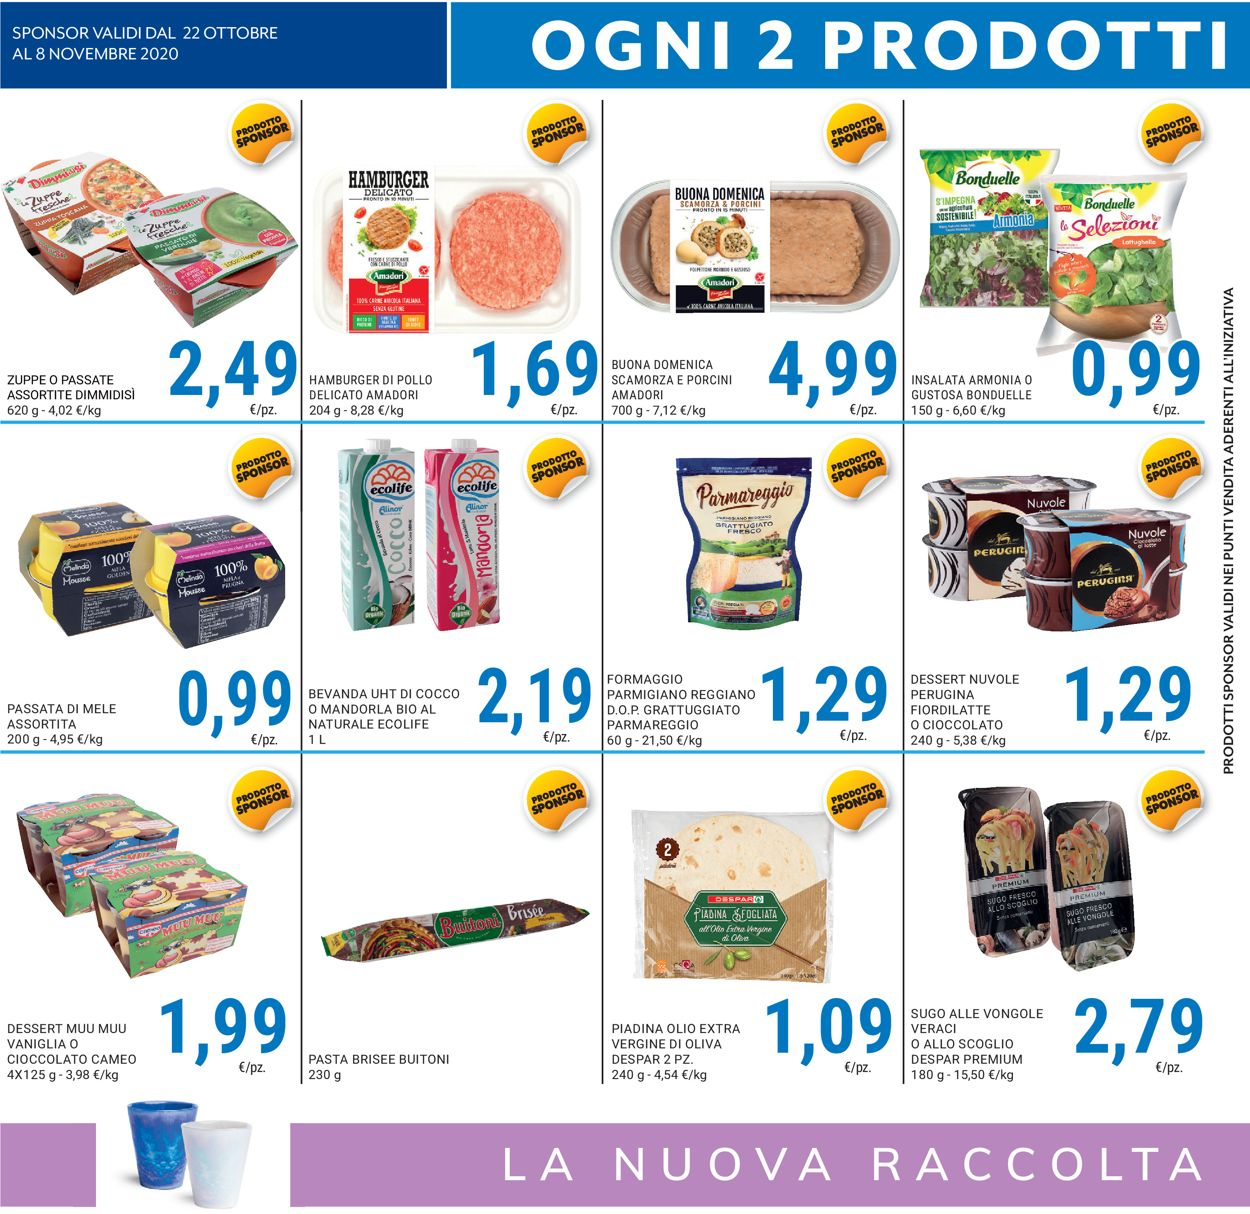 Volantino Interspar - Offerte 22/10-08/11/2020 (Pagina 4)